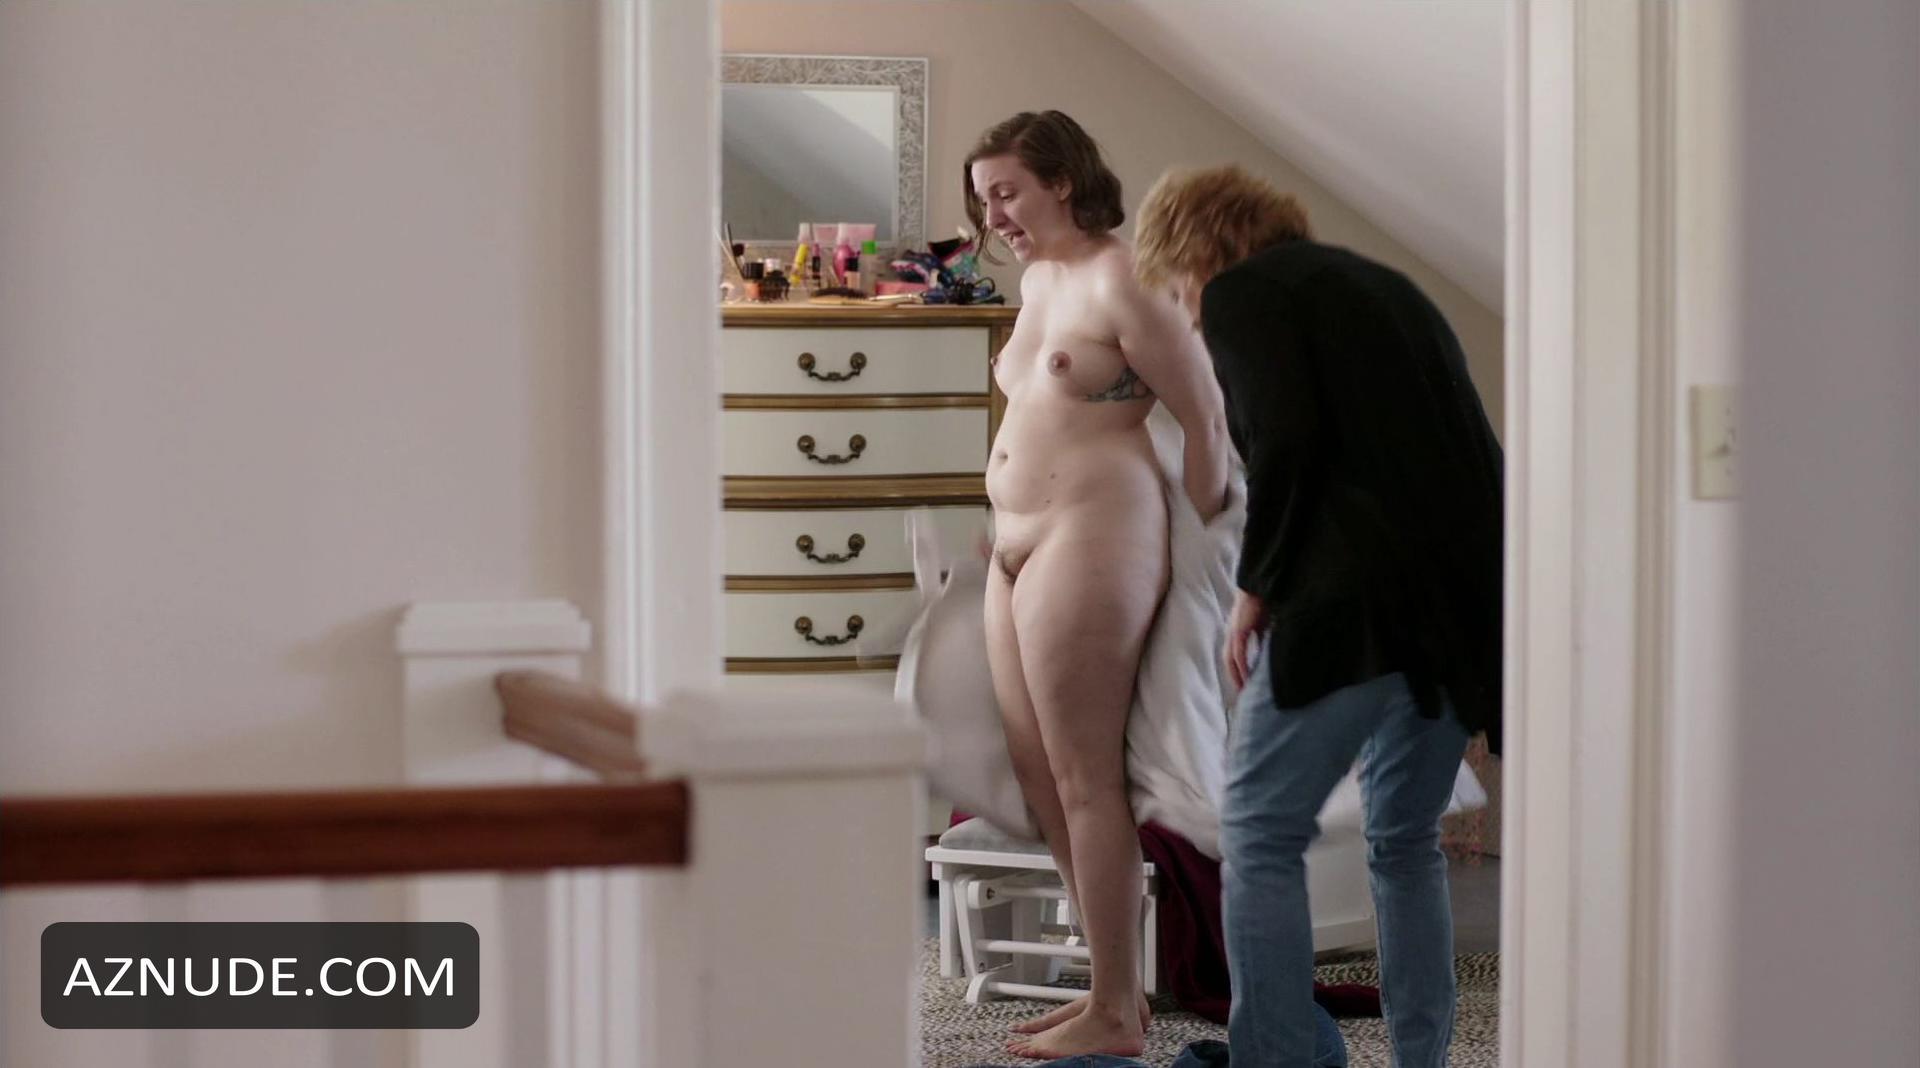 Britne Oldford Nude download sex pics lena dunham nude aznude | nude picture hd